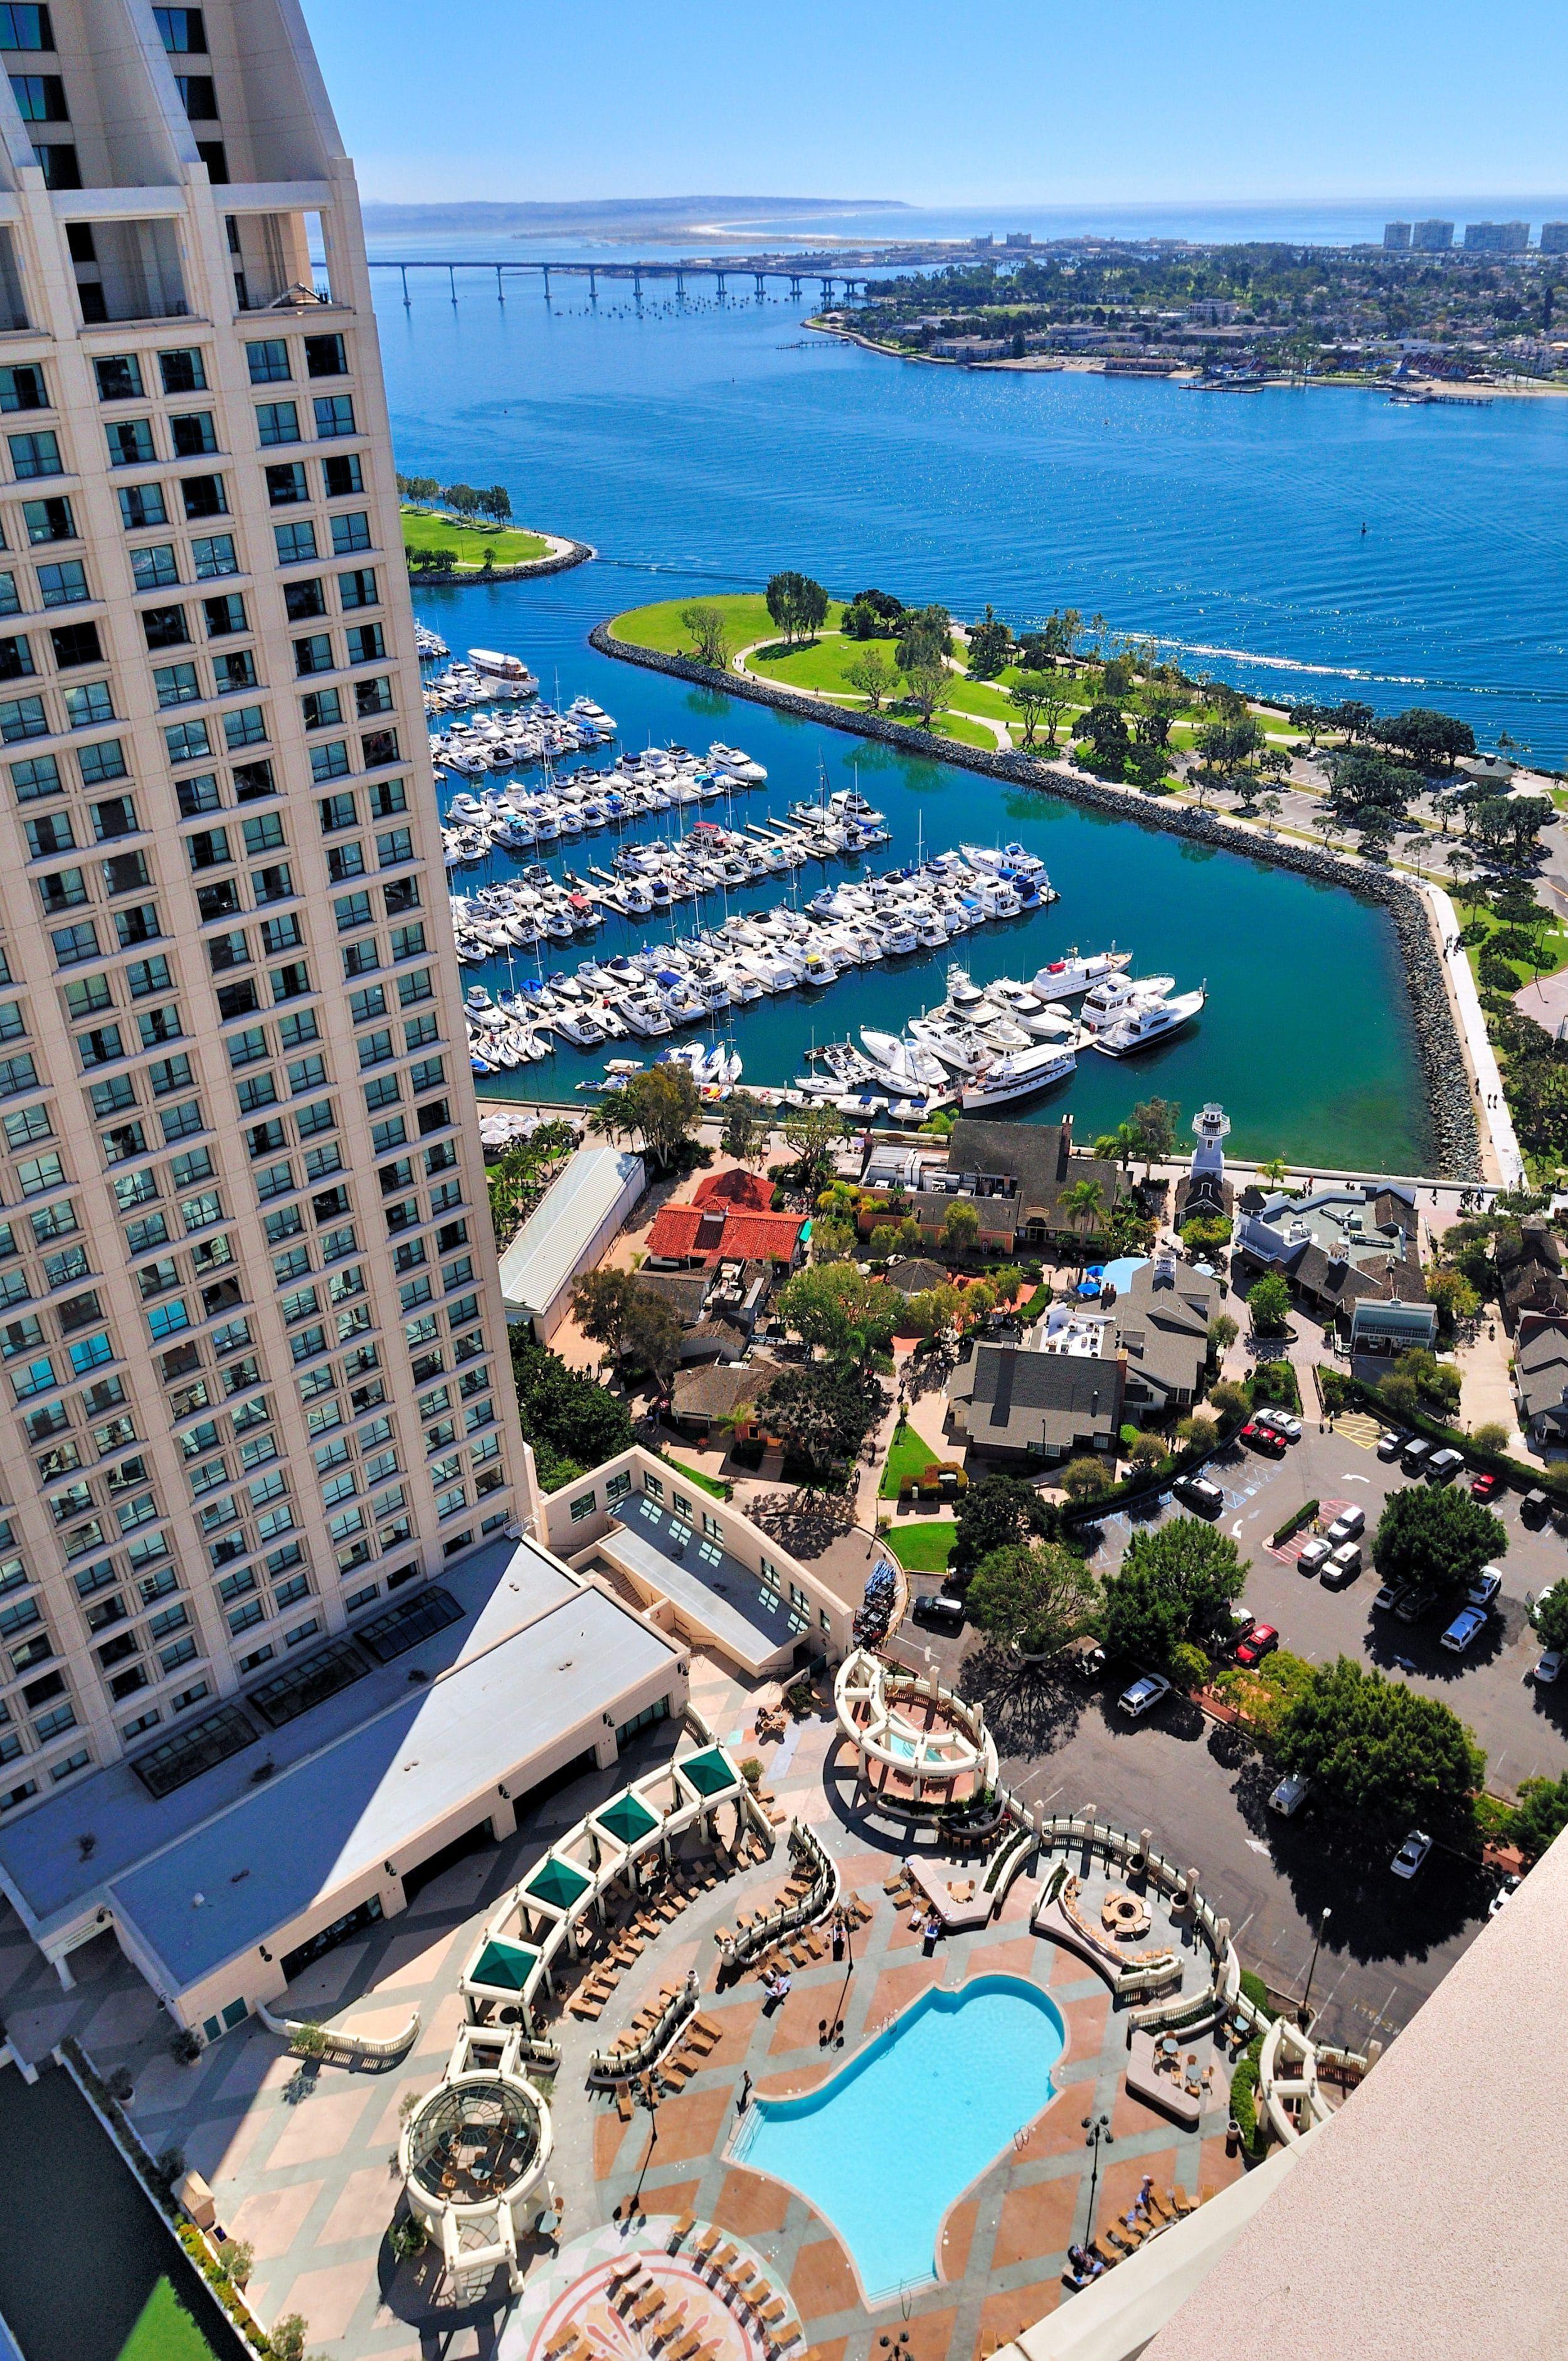 Manchester Grand Hyatt San Diego Review & Guide (2021) | La Jolla Mom | San  diego hotels, San diego travel, San diego vacation